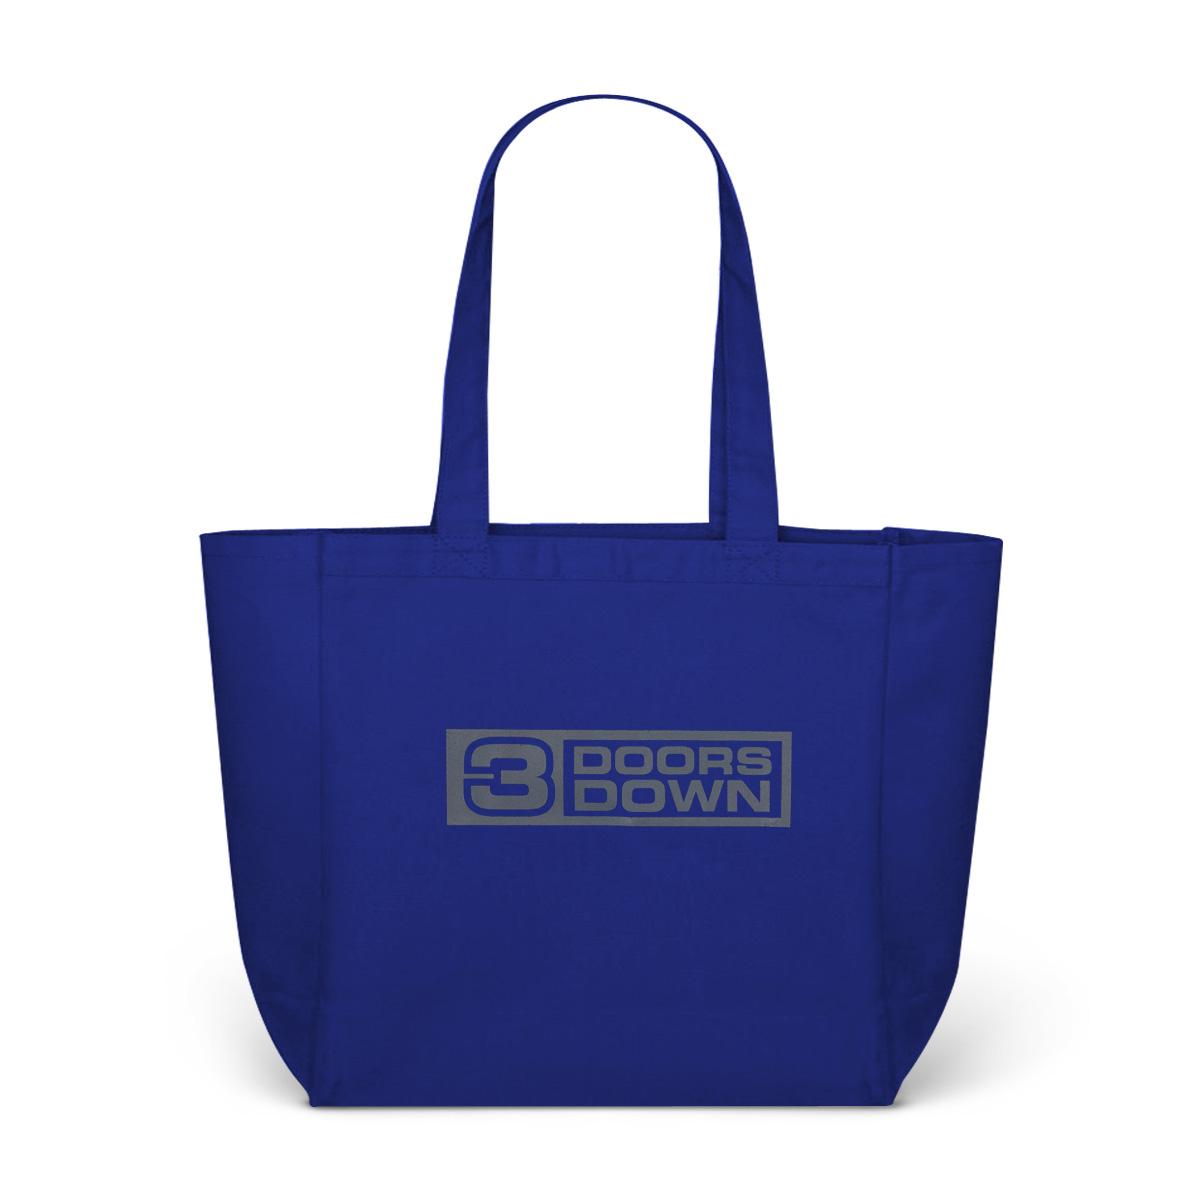 3 Doors Down Beach Bag